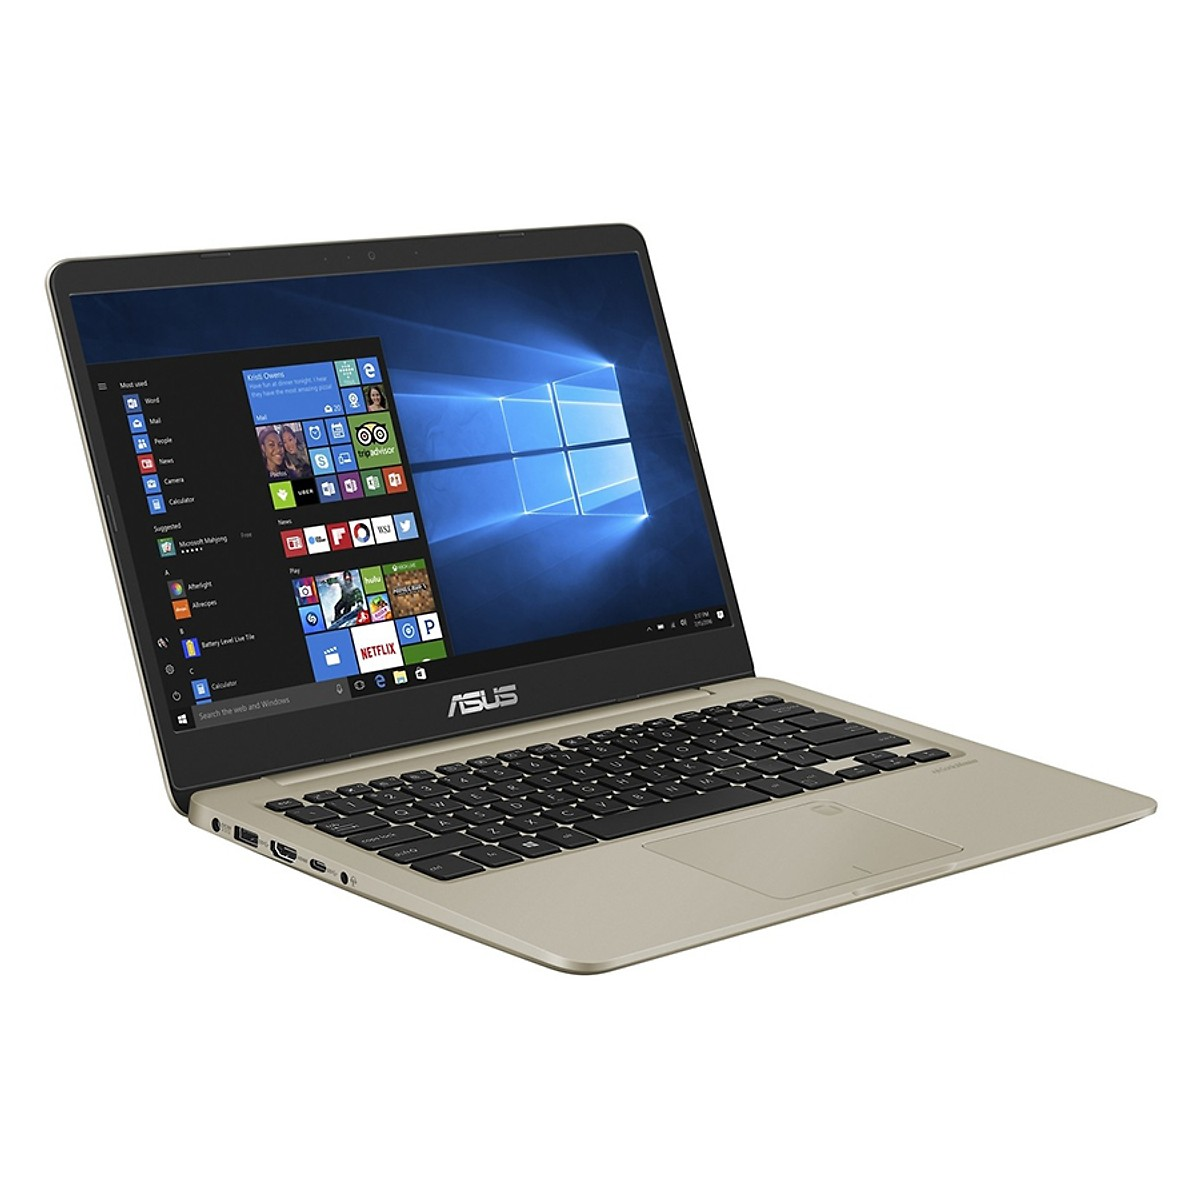 Asus   Máy tính xách tay - Laptop    Laptop Asus Vivobook S14 S410UN-EB279T Core i5-8250U/Win10 (14